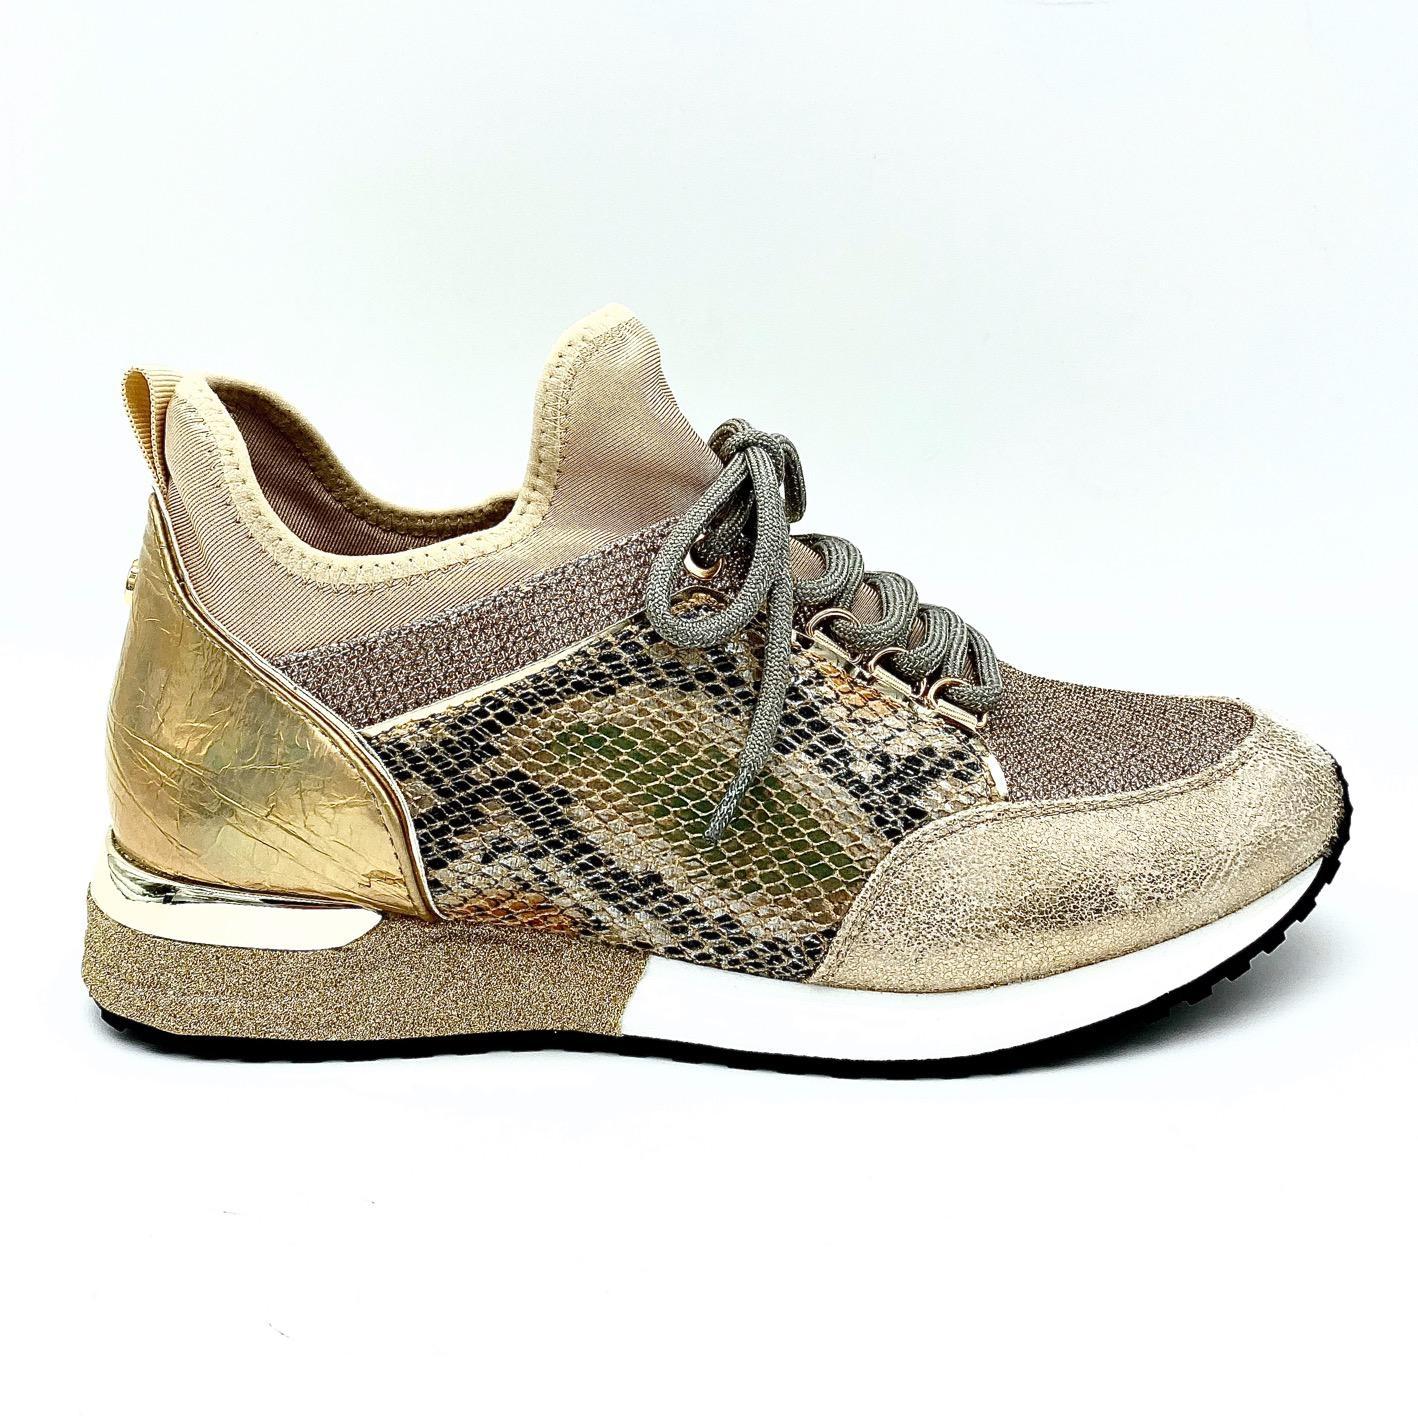 Sneaker Cracked Gold